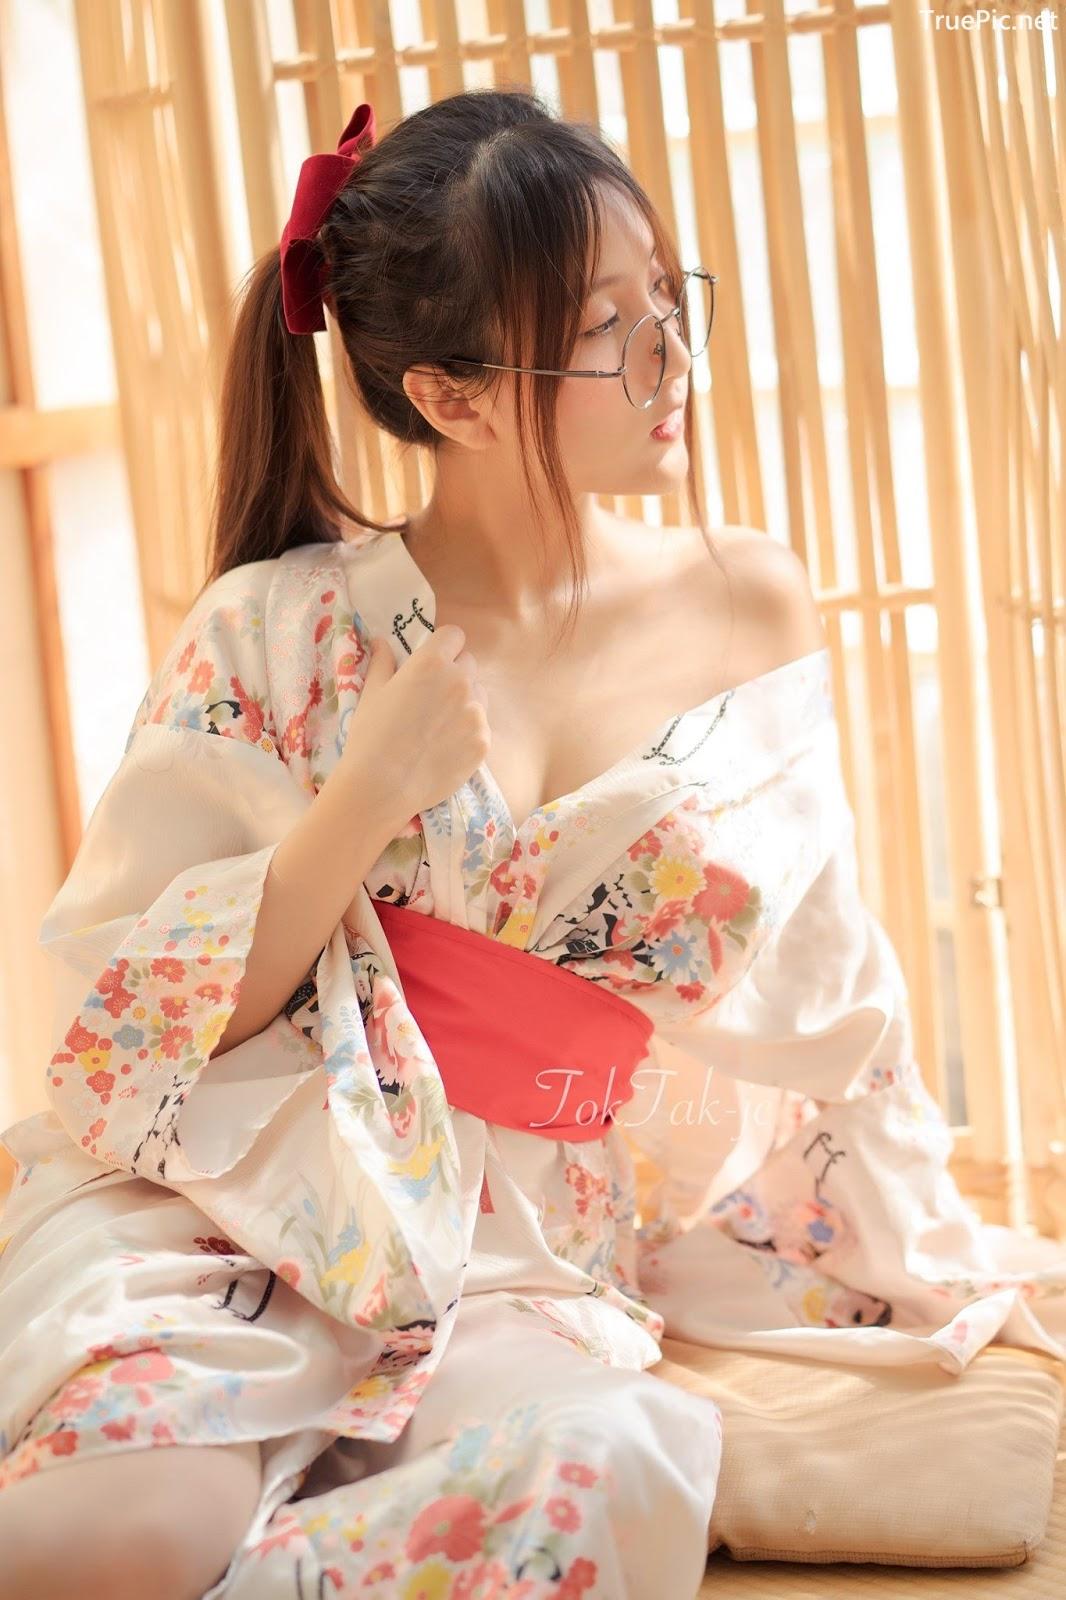 Image Thailand Model - Phunnita Intarapimai - Sexy Kendo Girl - TruePic.net - Picture-2